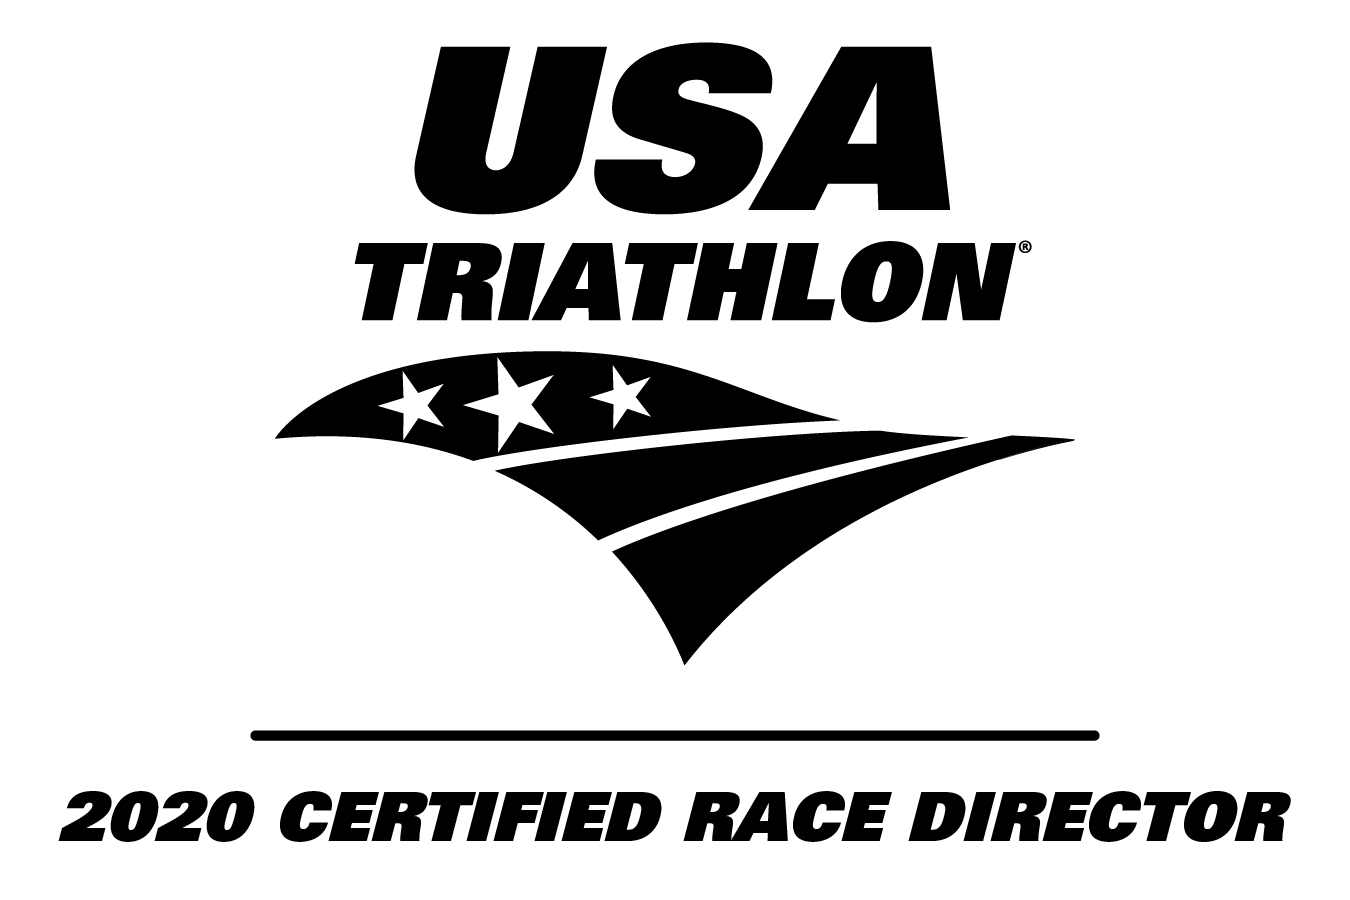 usa triathlon certified race director level 2